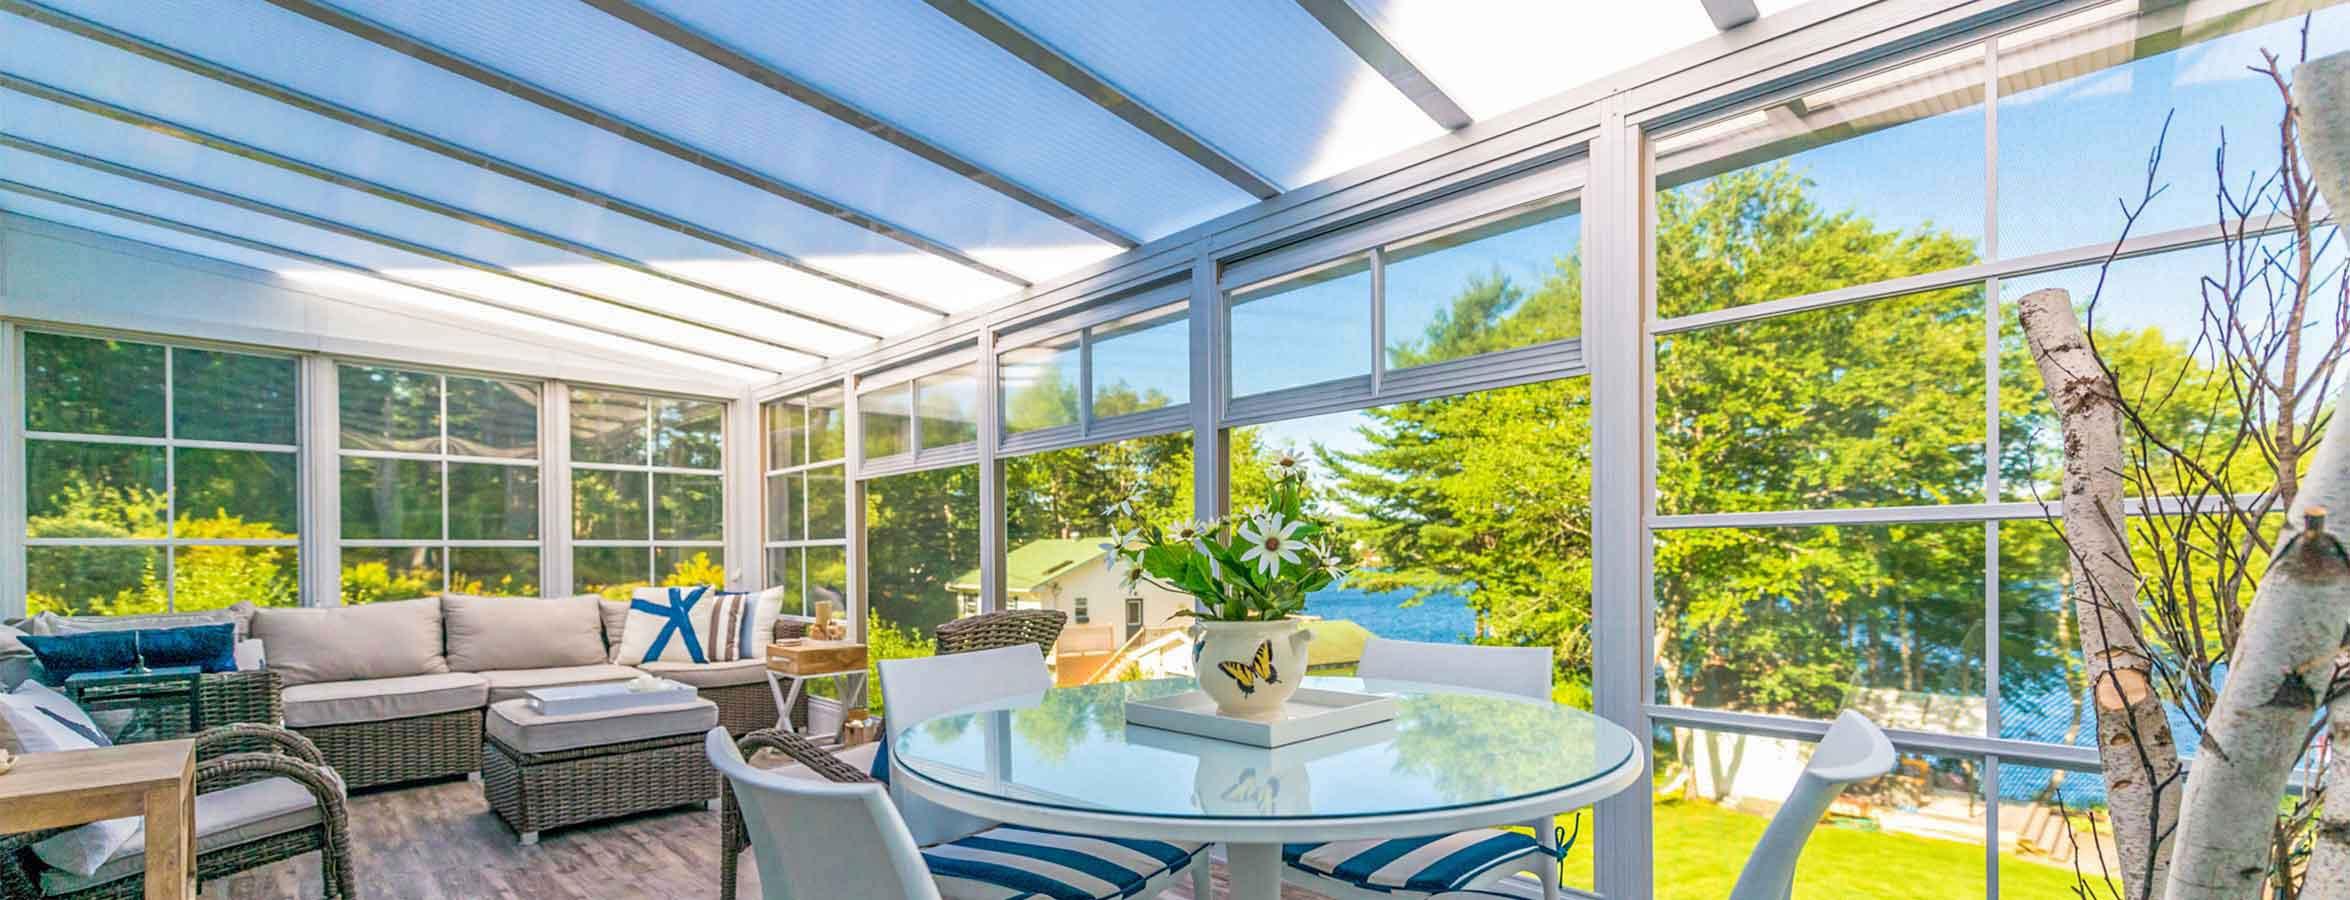 sunspace sunrooms home